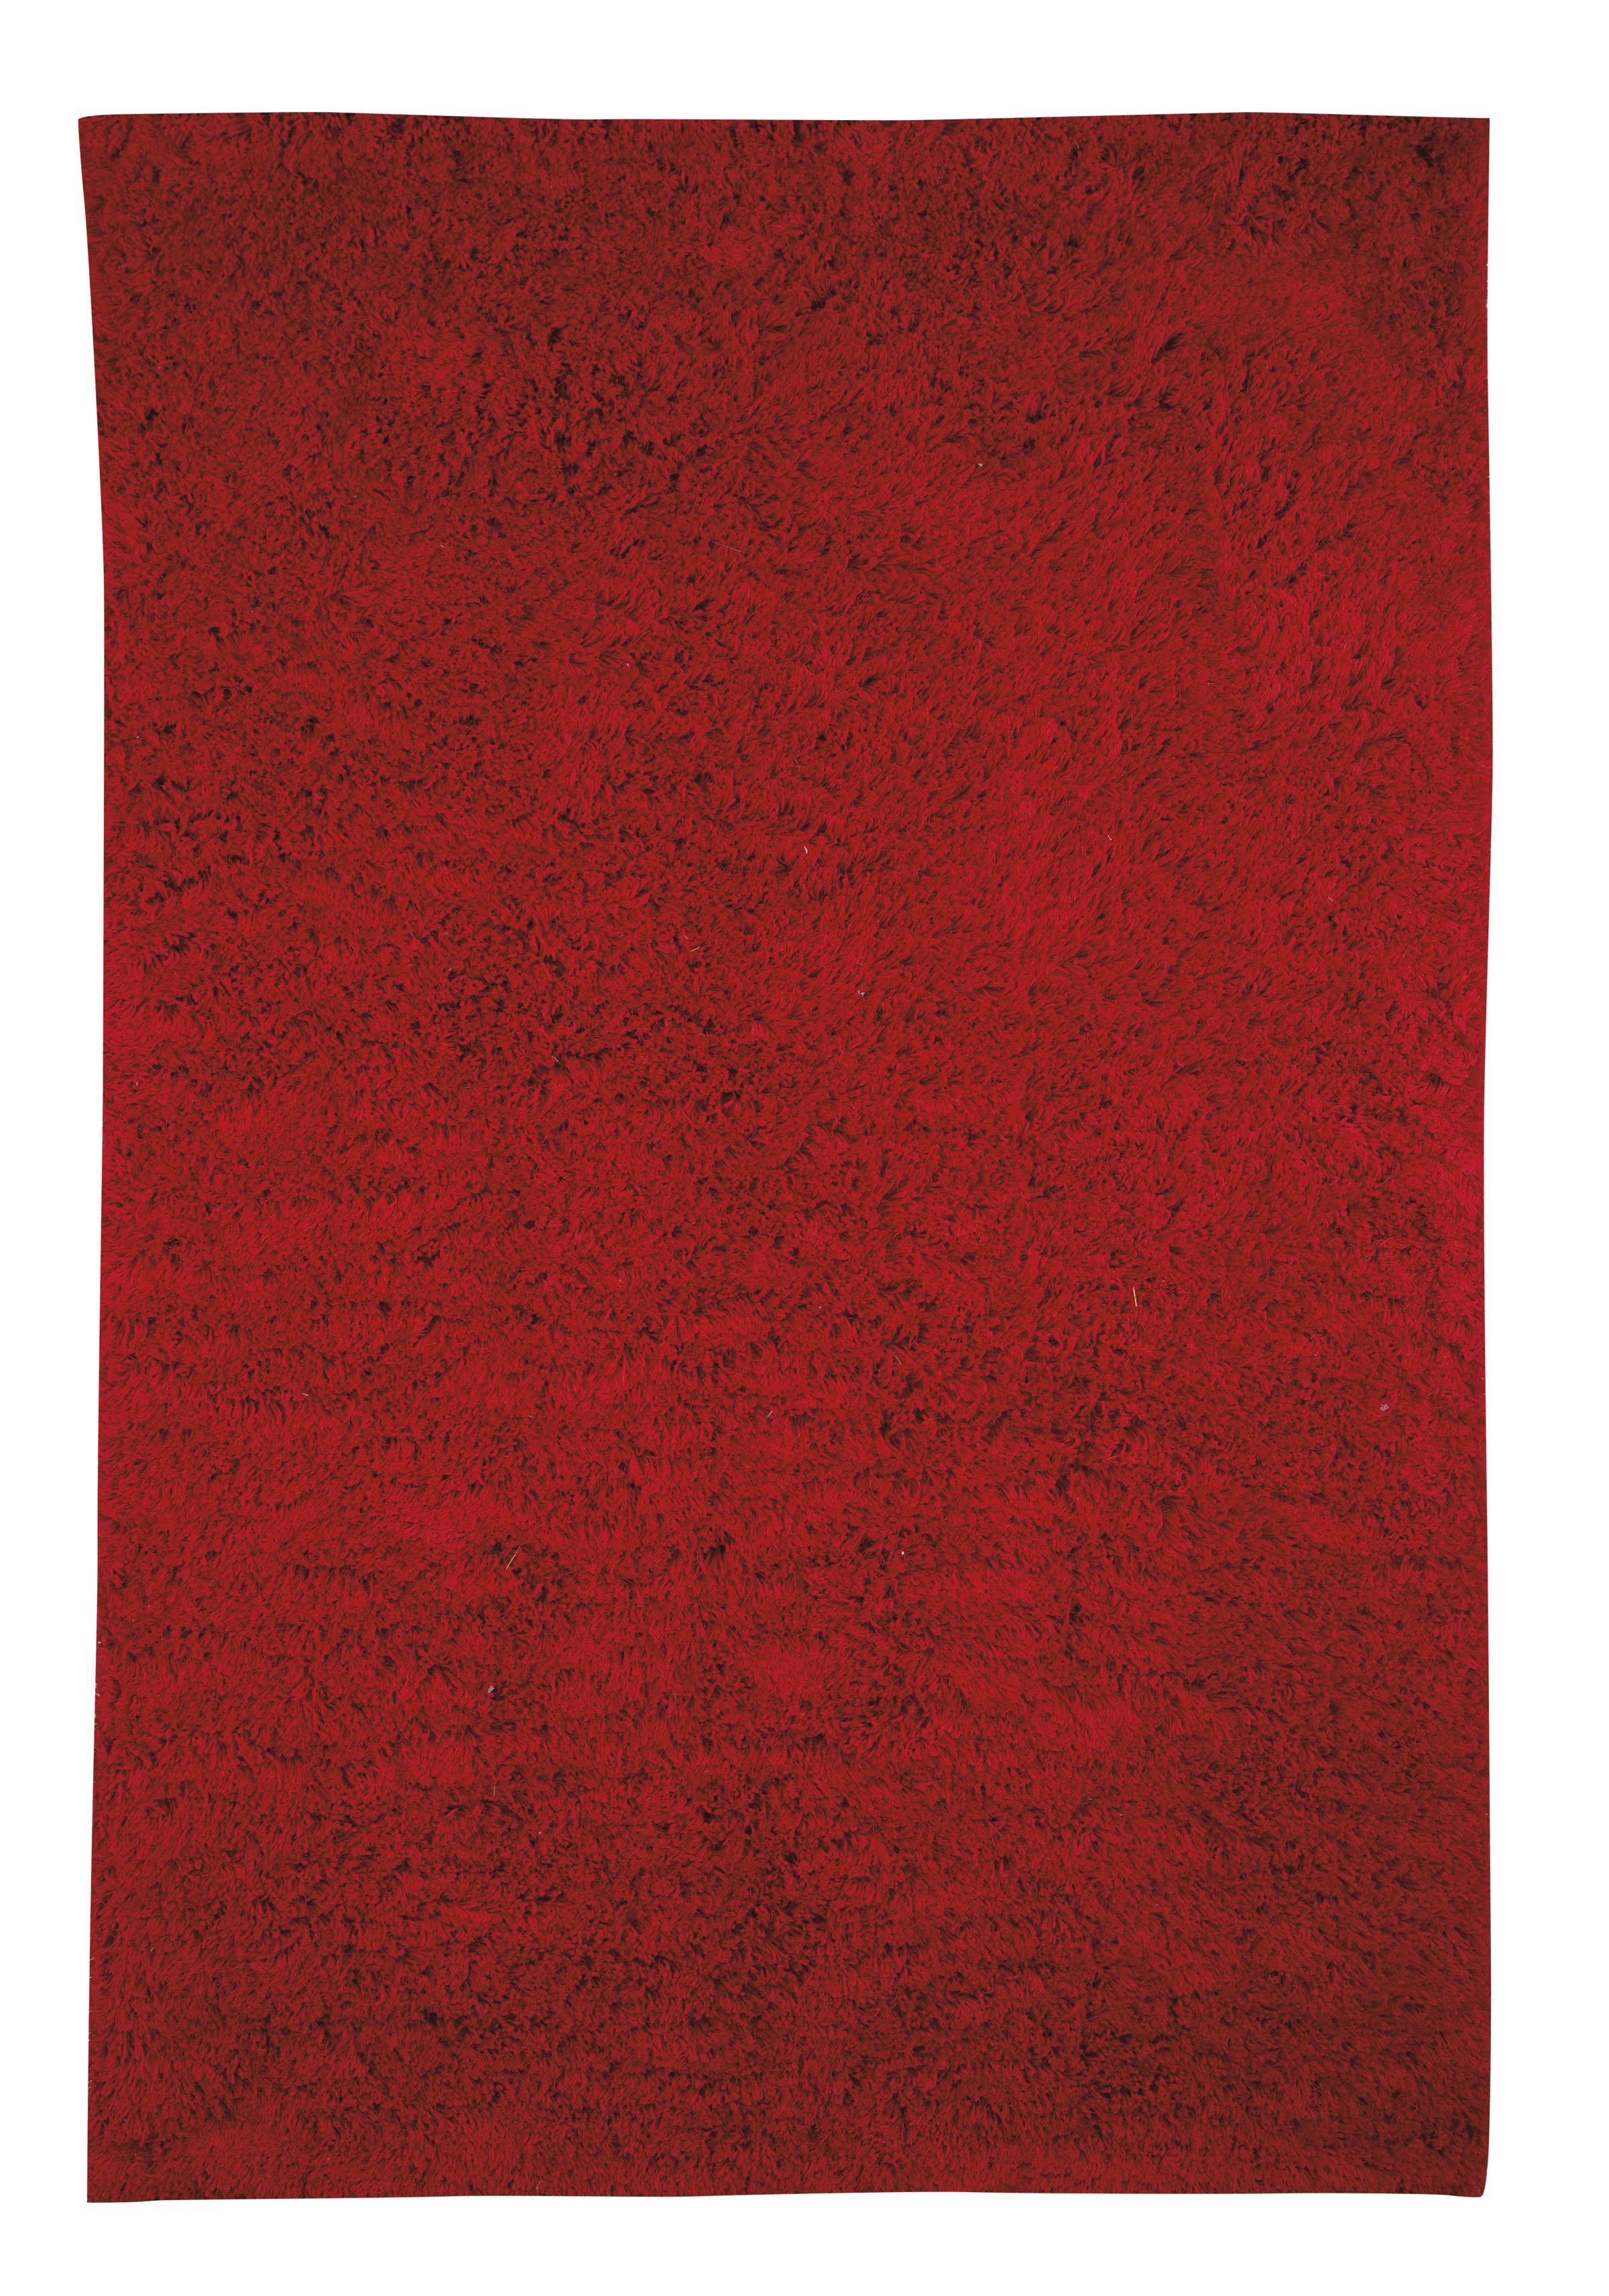 Signature design by ashley contemporary area rugs r400512 for Red area rugs contemporary